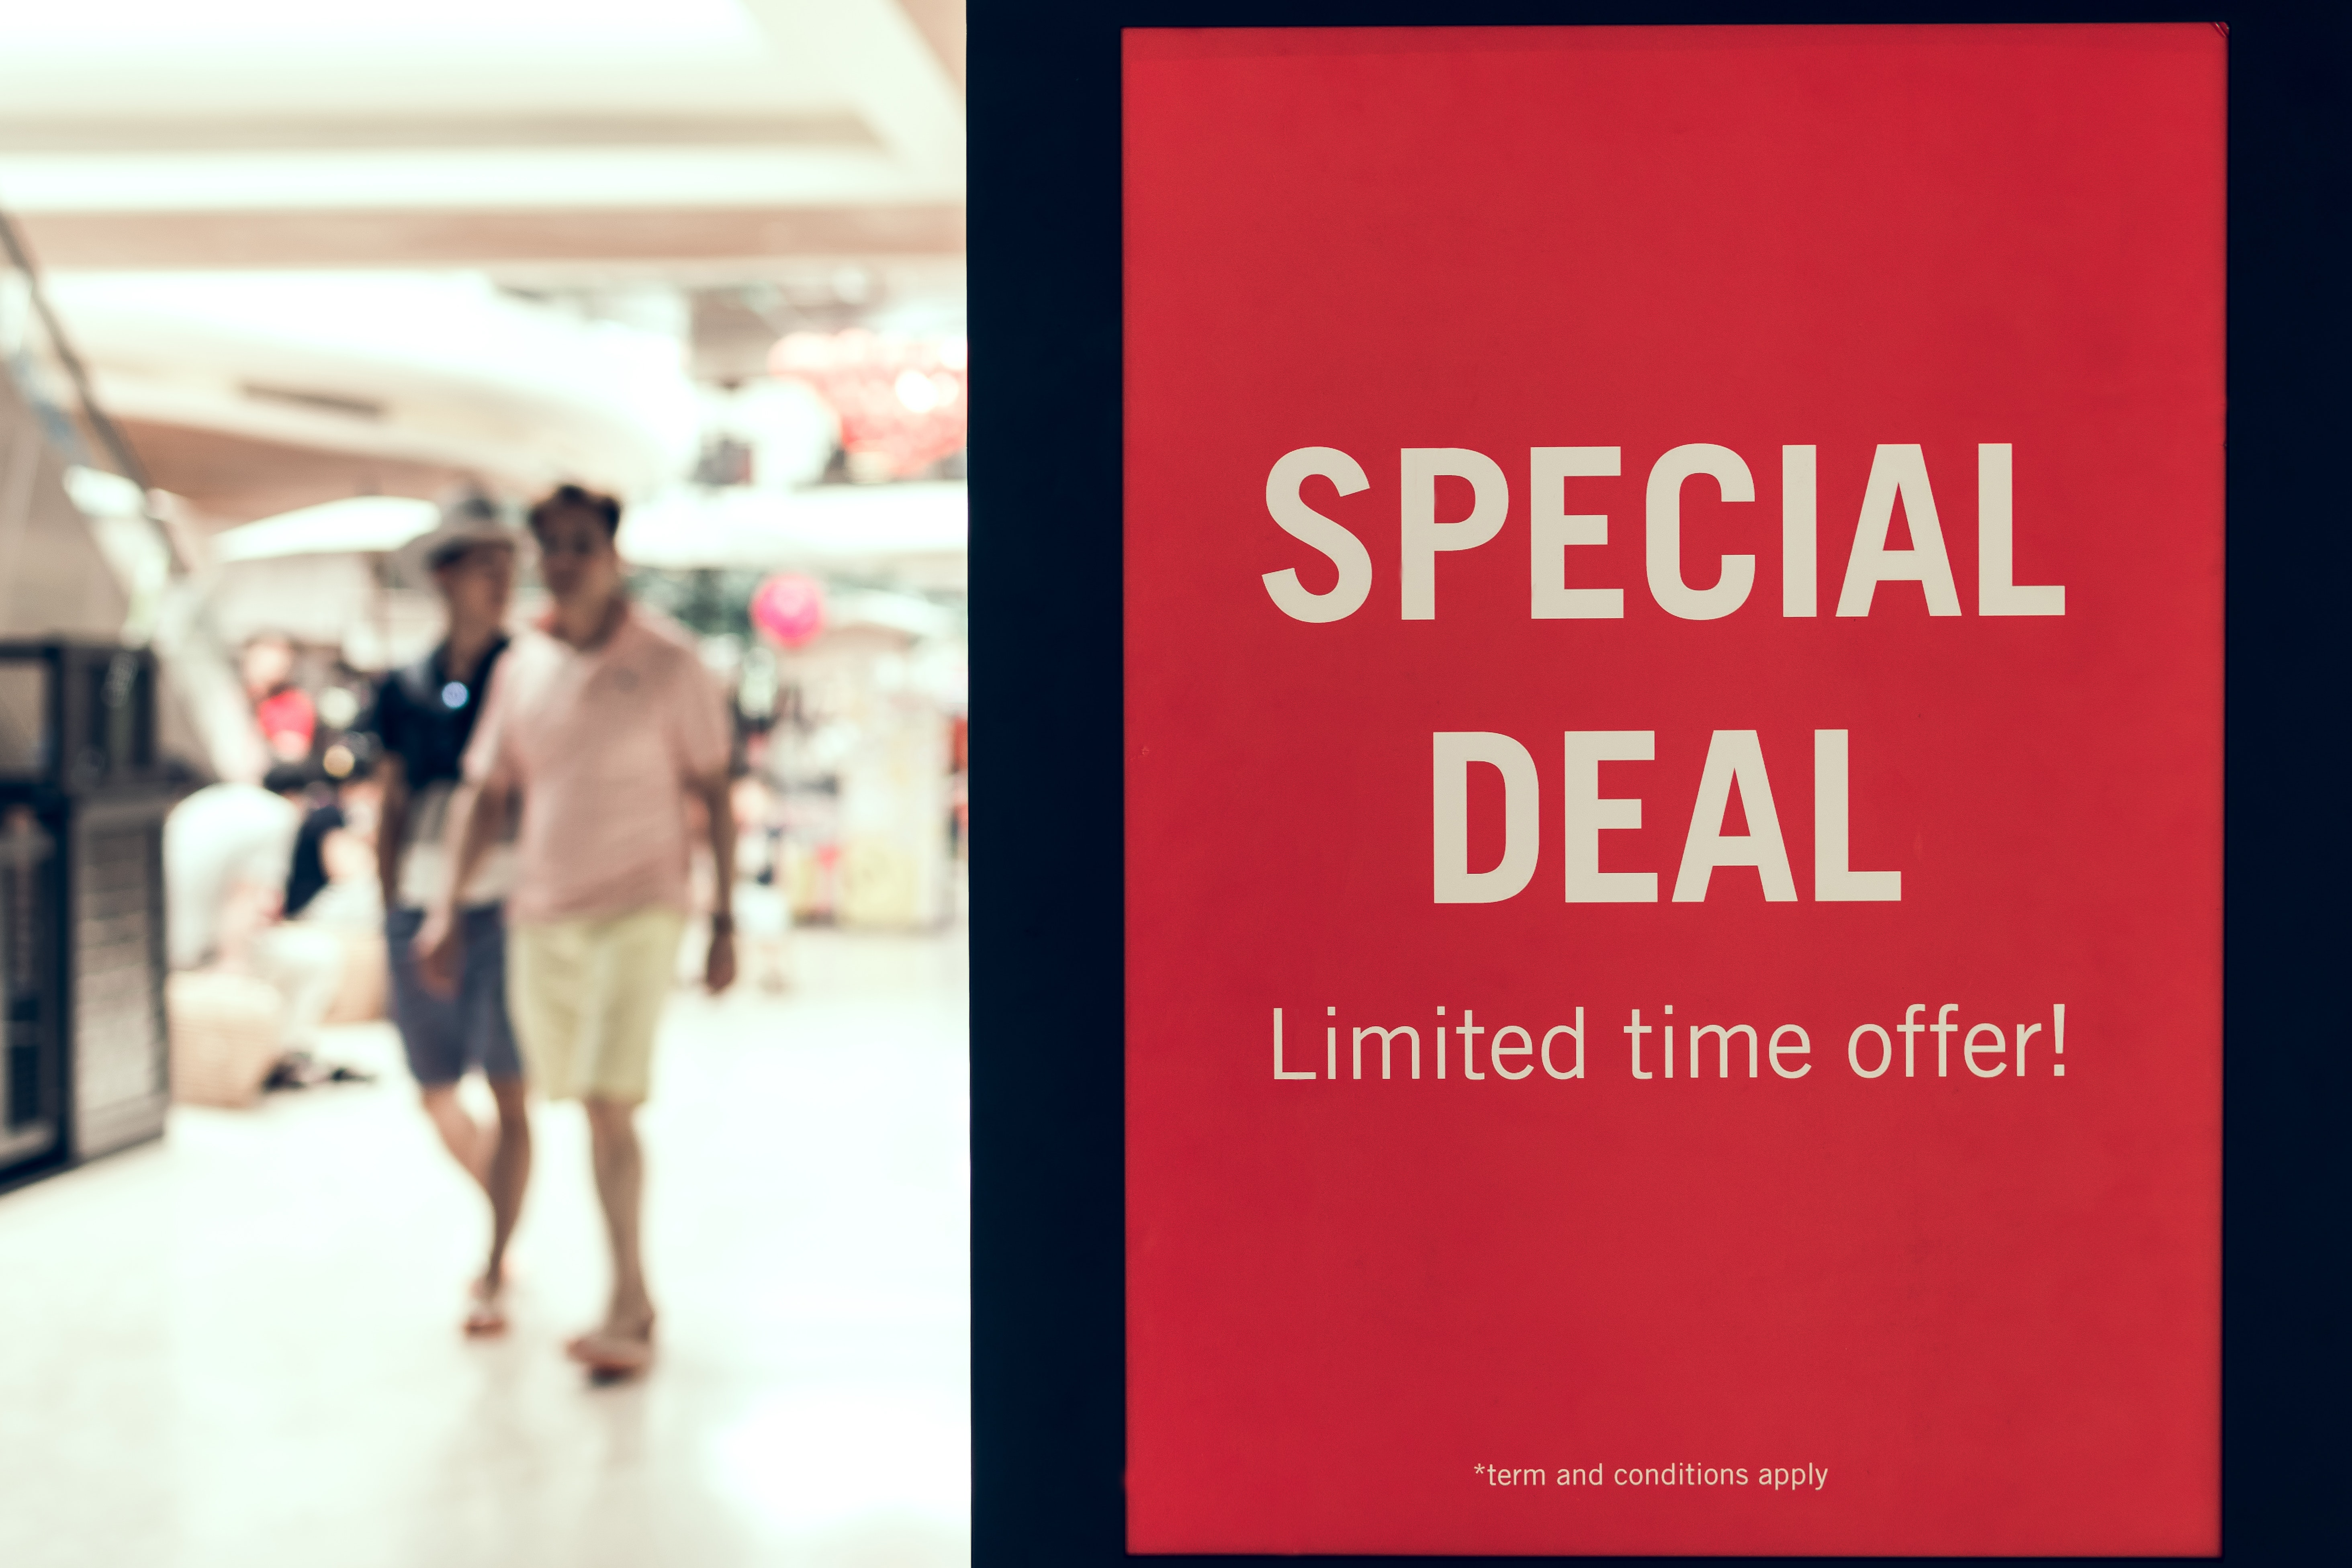 adult-advertisement-airport-1114376.jpg